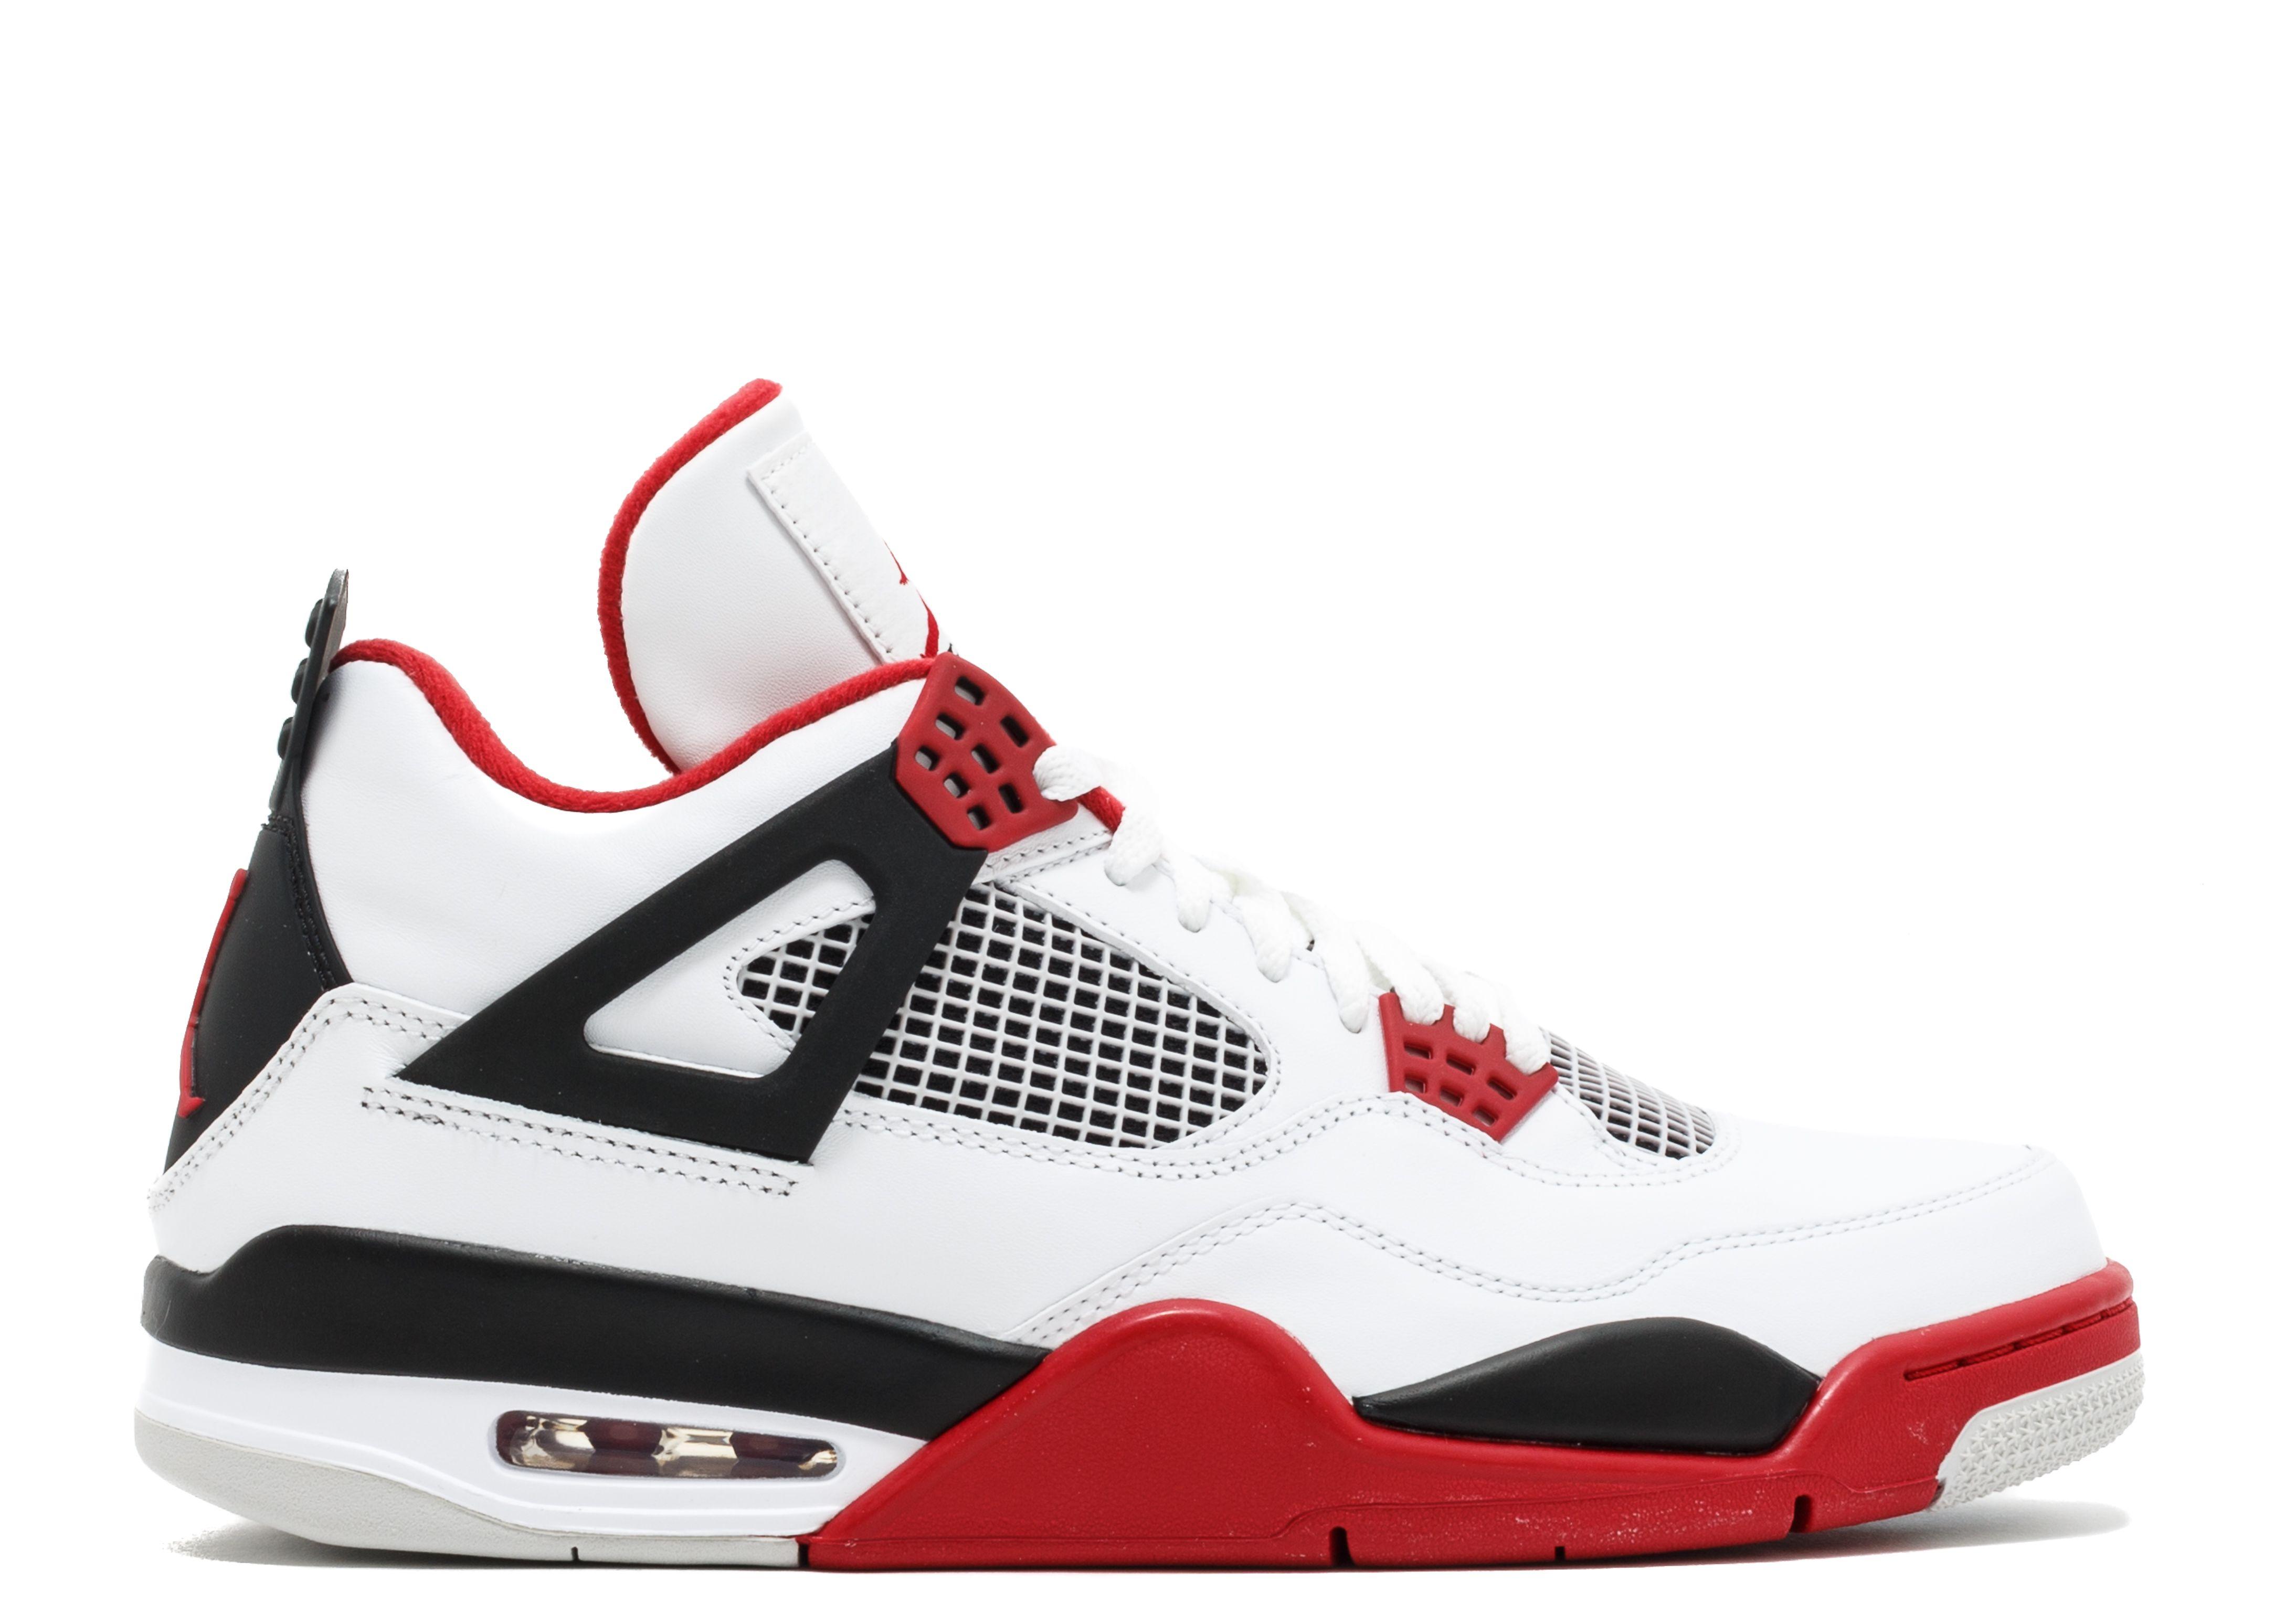 cheap for discount 5ea74 dc749 Jordan 4 Retro Fire Red Mars Blackmon. Buy ...